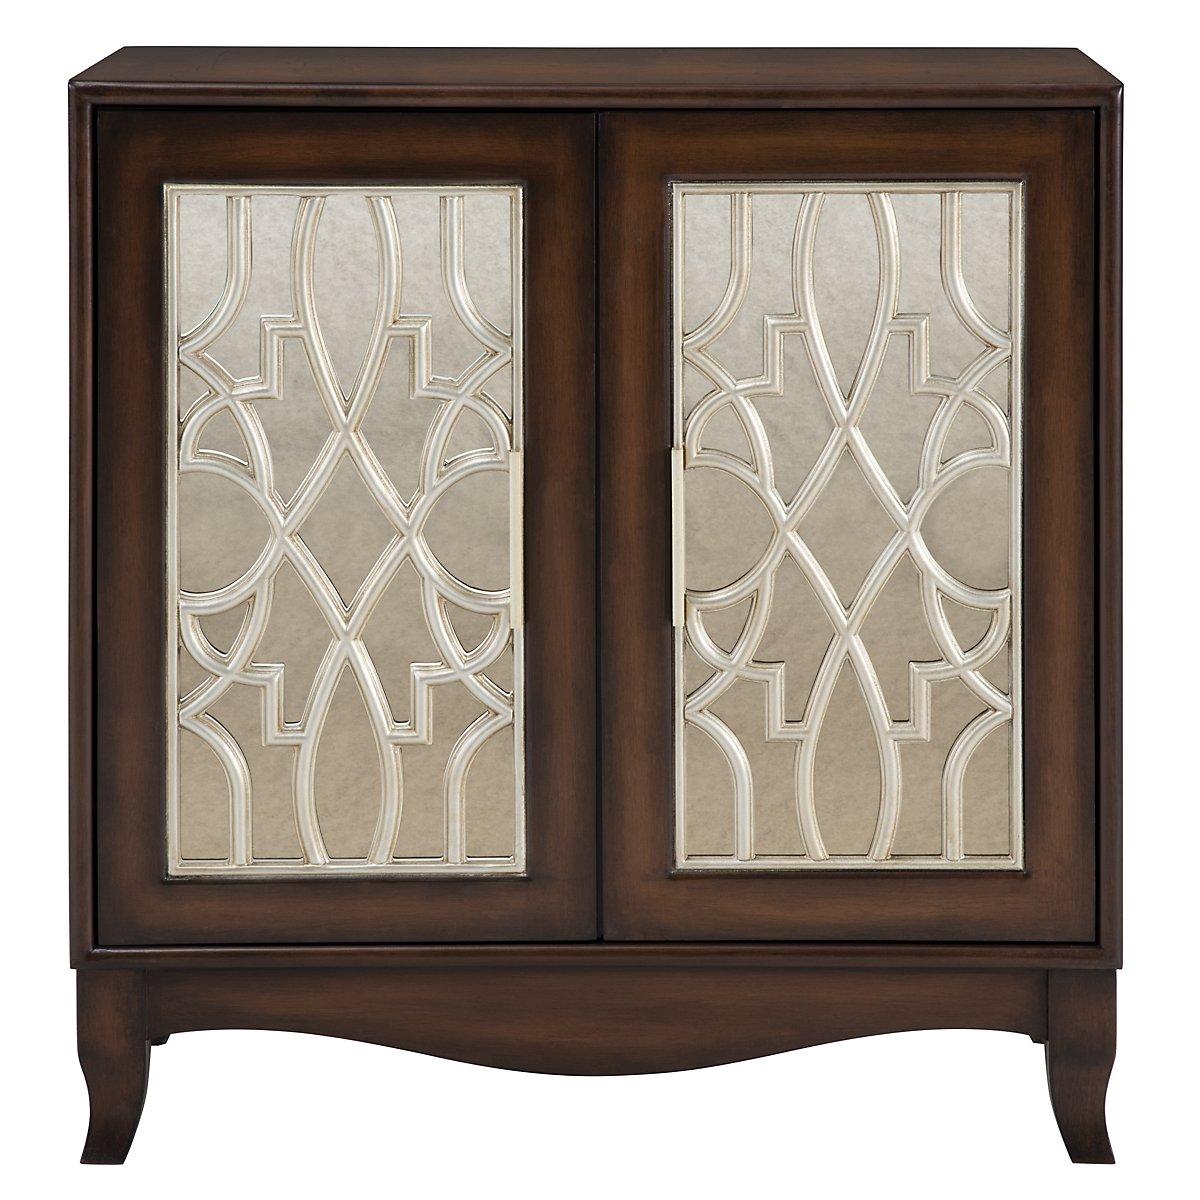 Marley Mid Tone Two-Door Cabinet